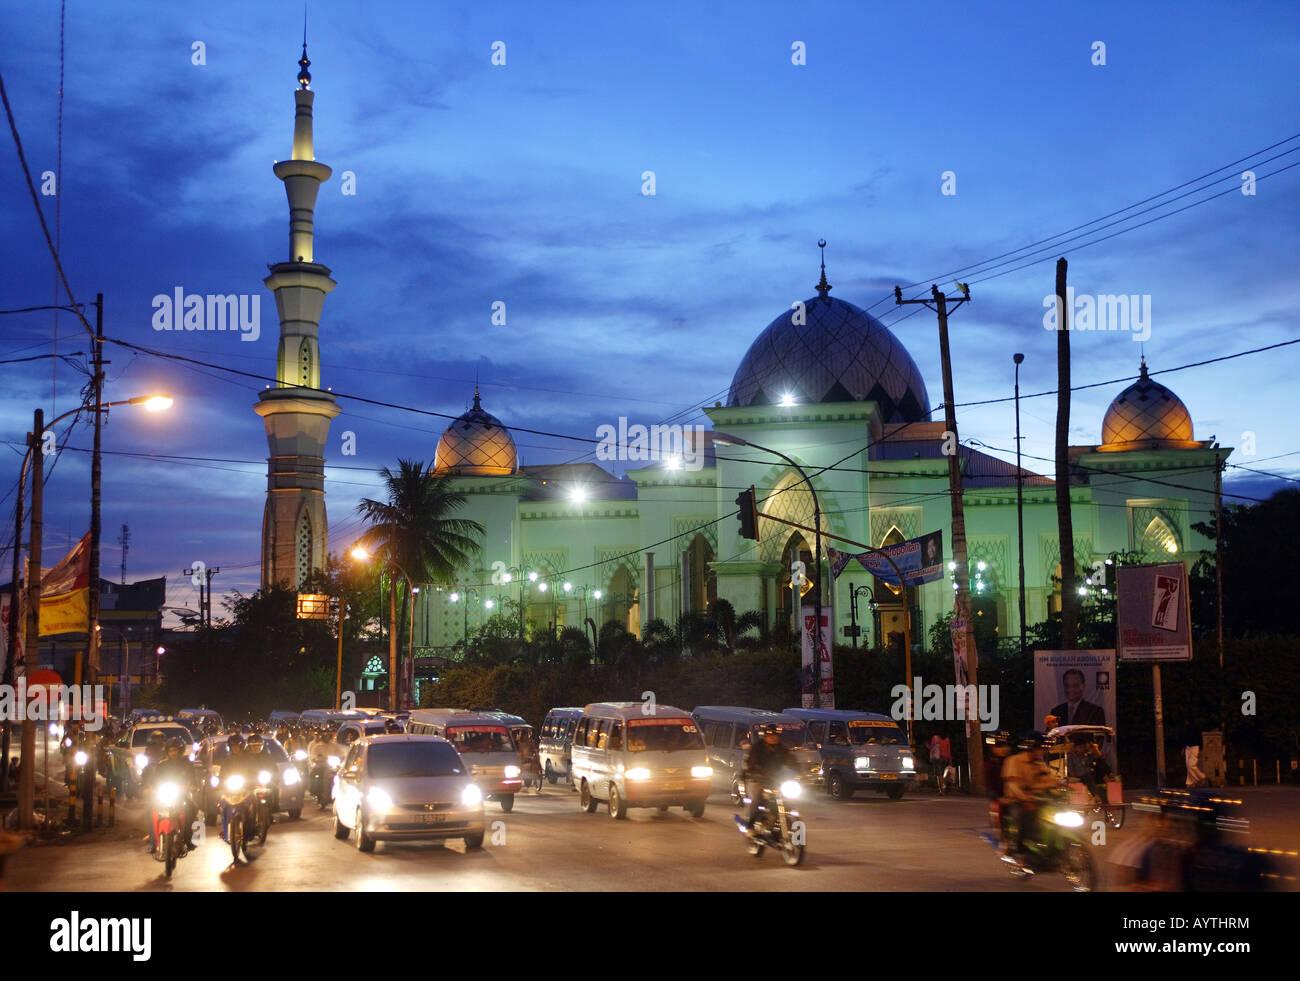 Indonesia: Masjid Raya Mosque in Makassar, Sulawesi Island - Stock Image